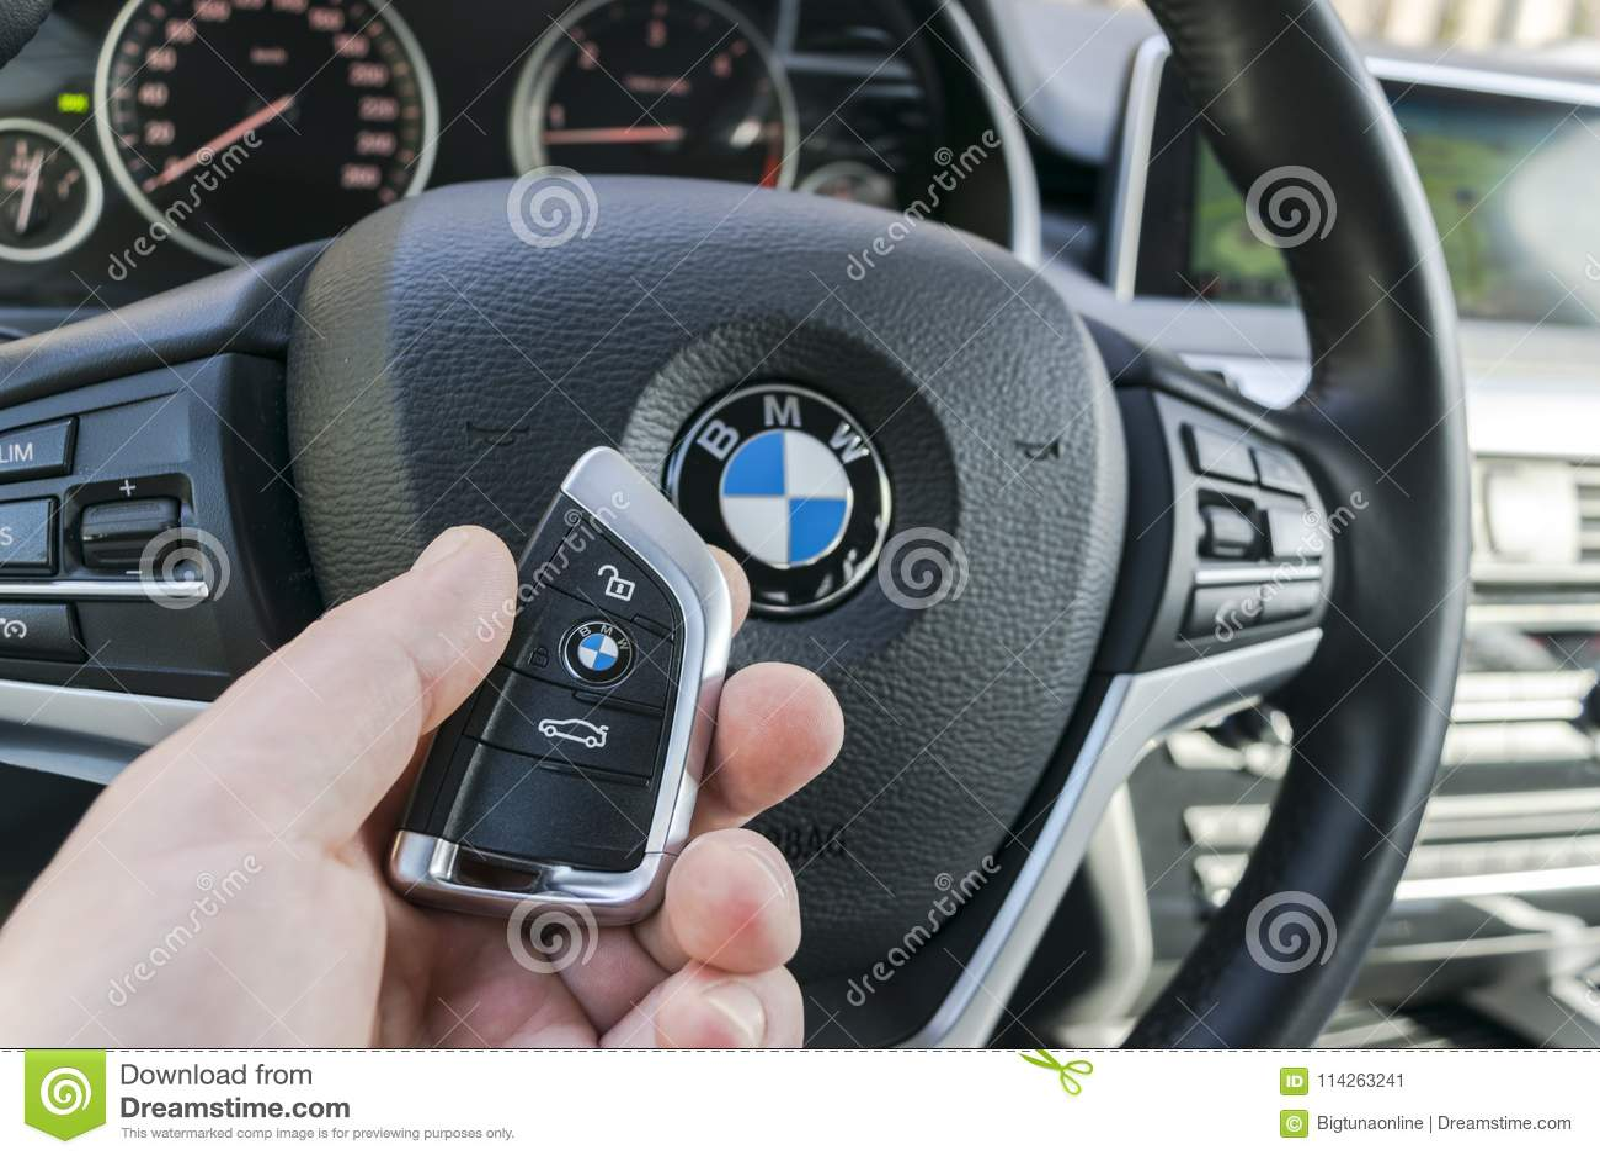 man`s hand holding a wireless bmw x5 f15 car key in black leather